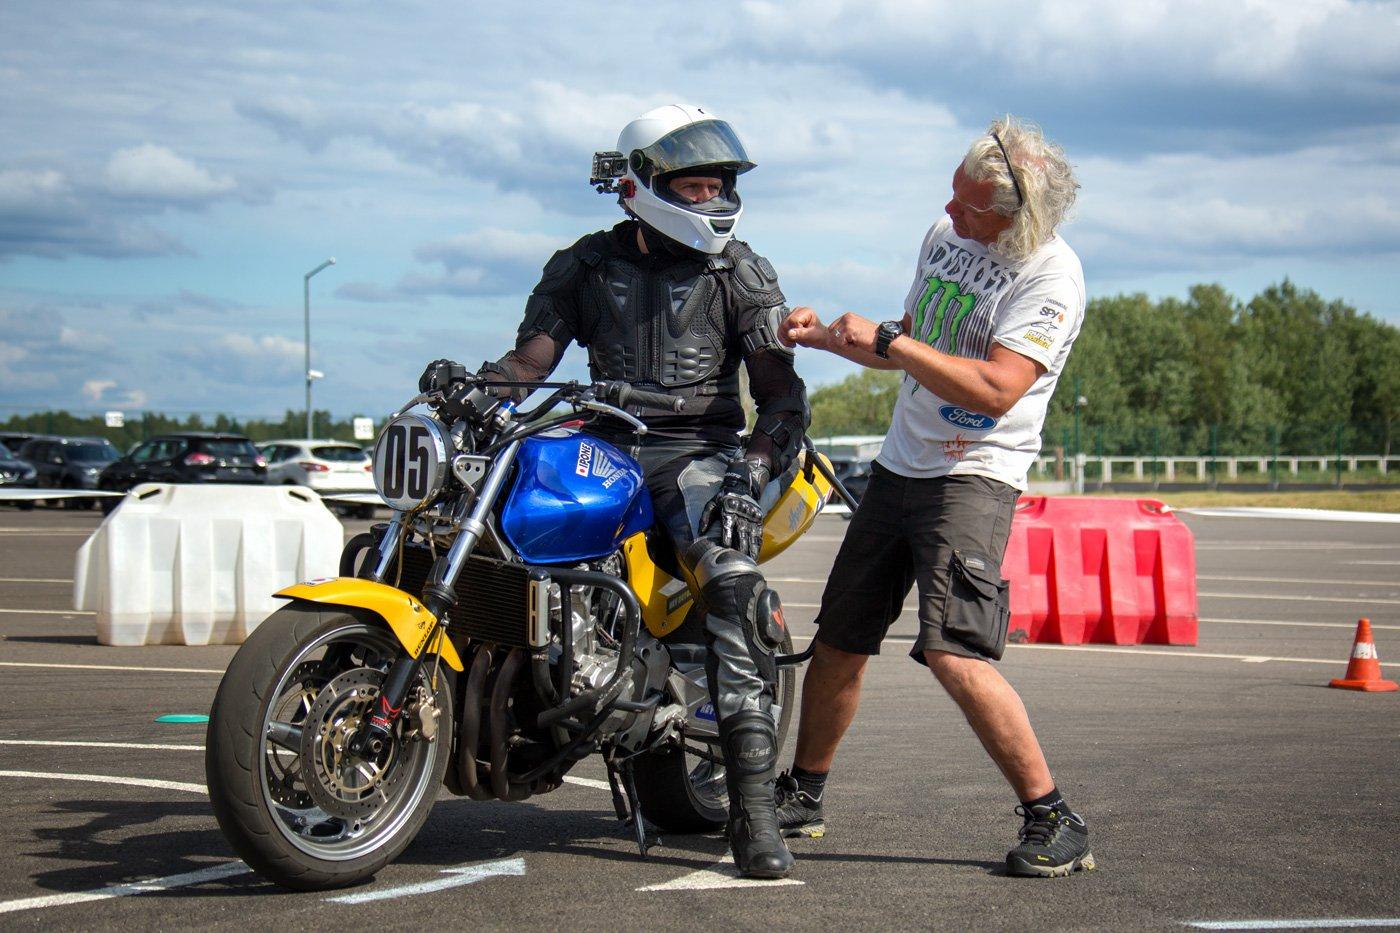 Мотошкола, обучение езды на мотоцикле